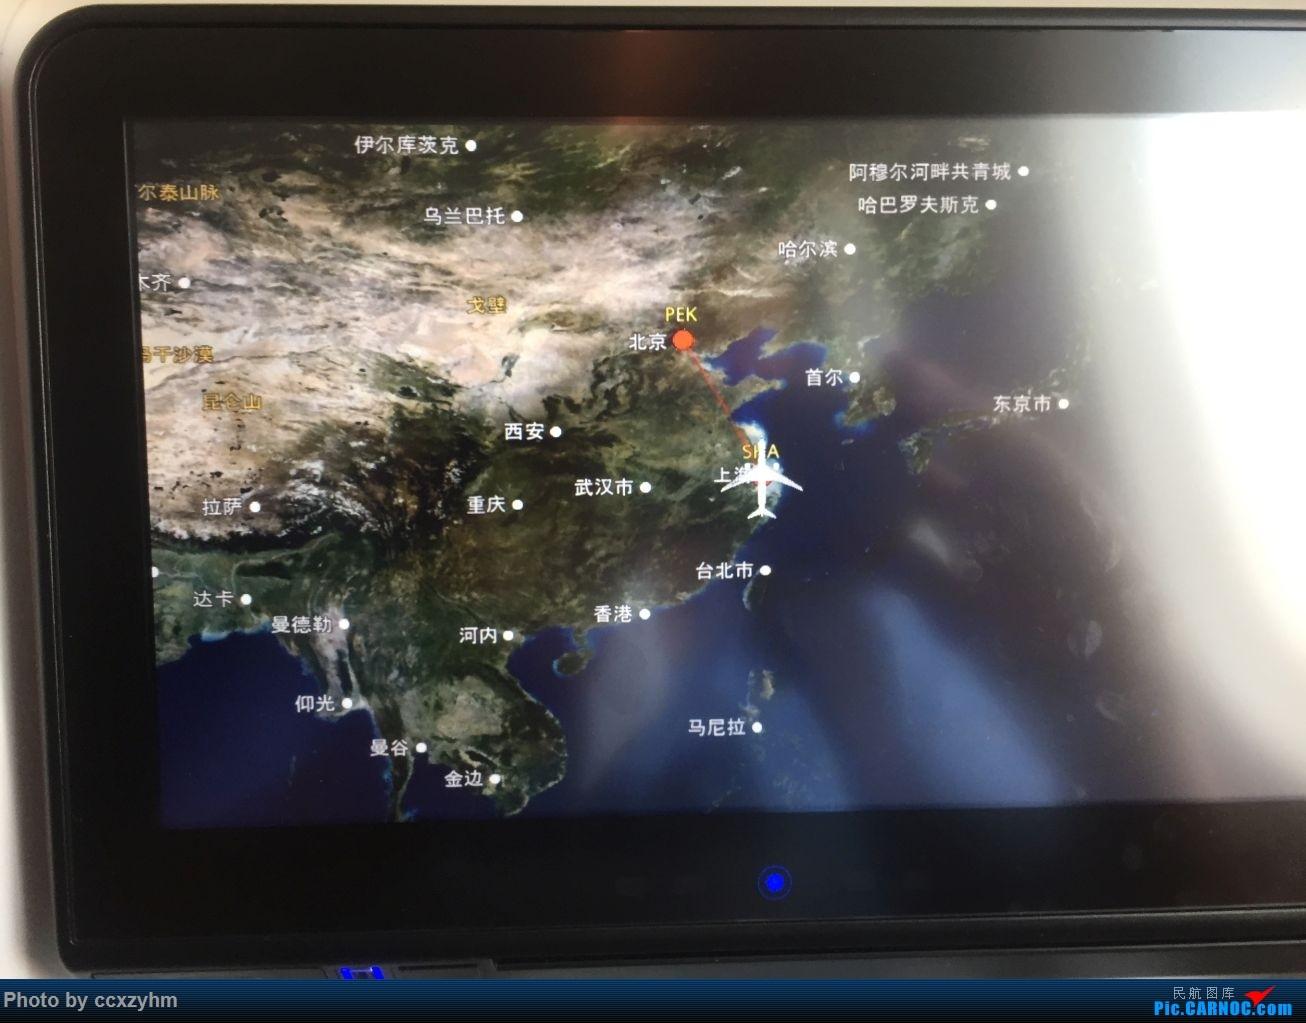 Re:[原创]论坛首发 京沪线上的国航789 高二升高三暑假短Break 空铁联运去北京 BOEING 787-9 B-7877